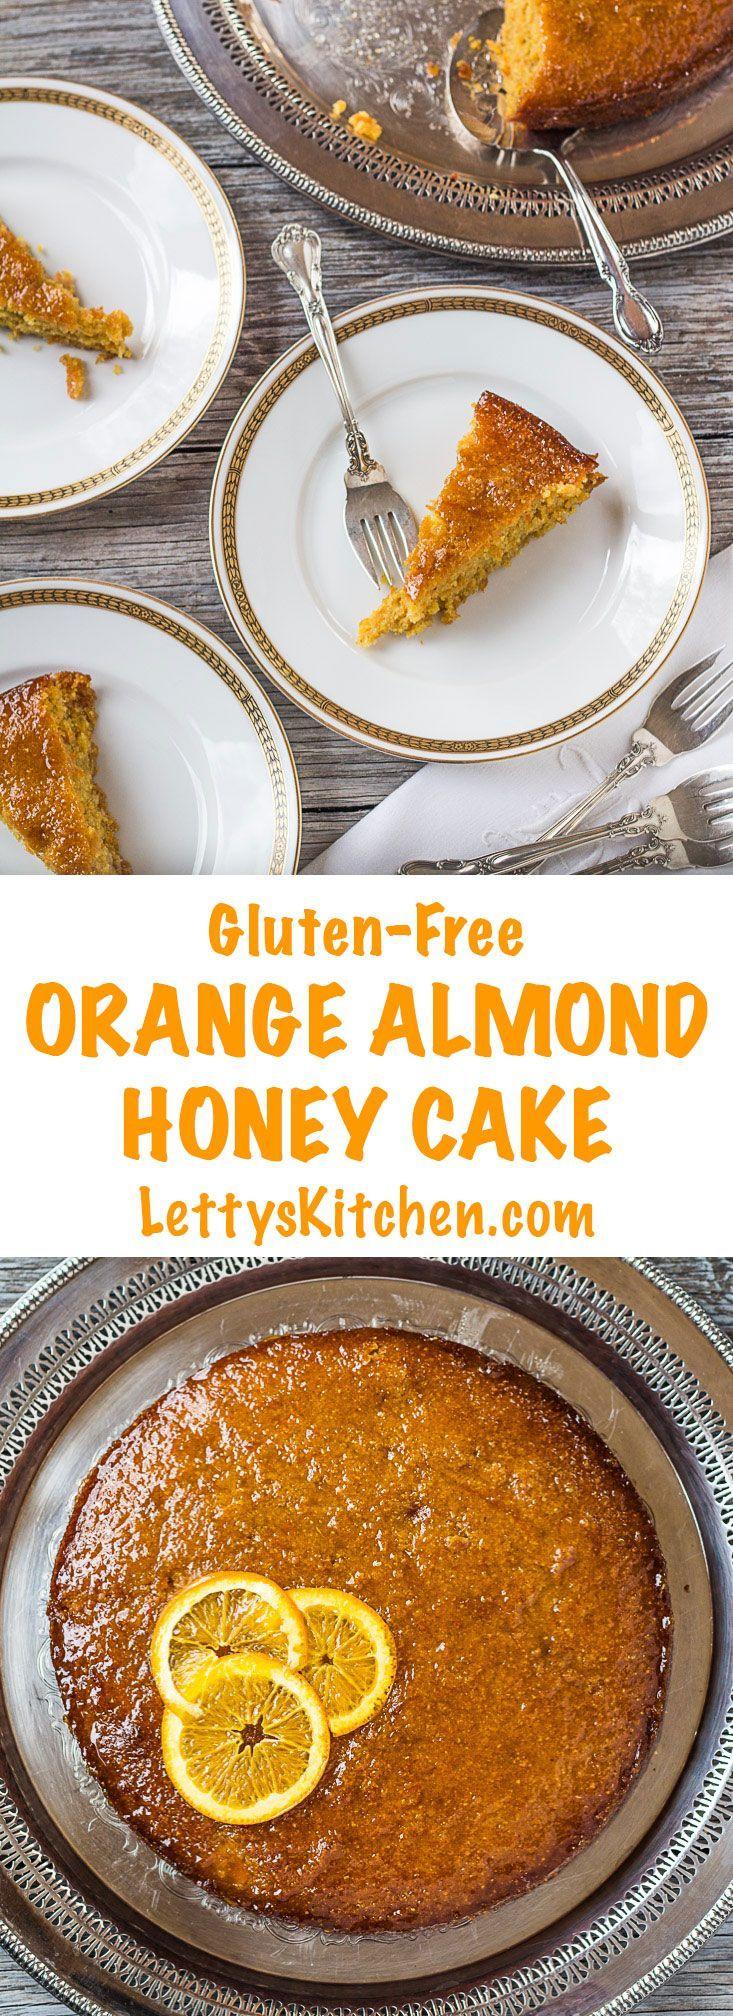 Orange Almond Honey Cake - Letty's Kitchen